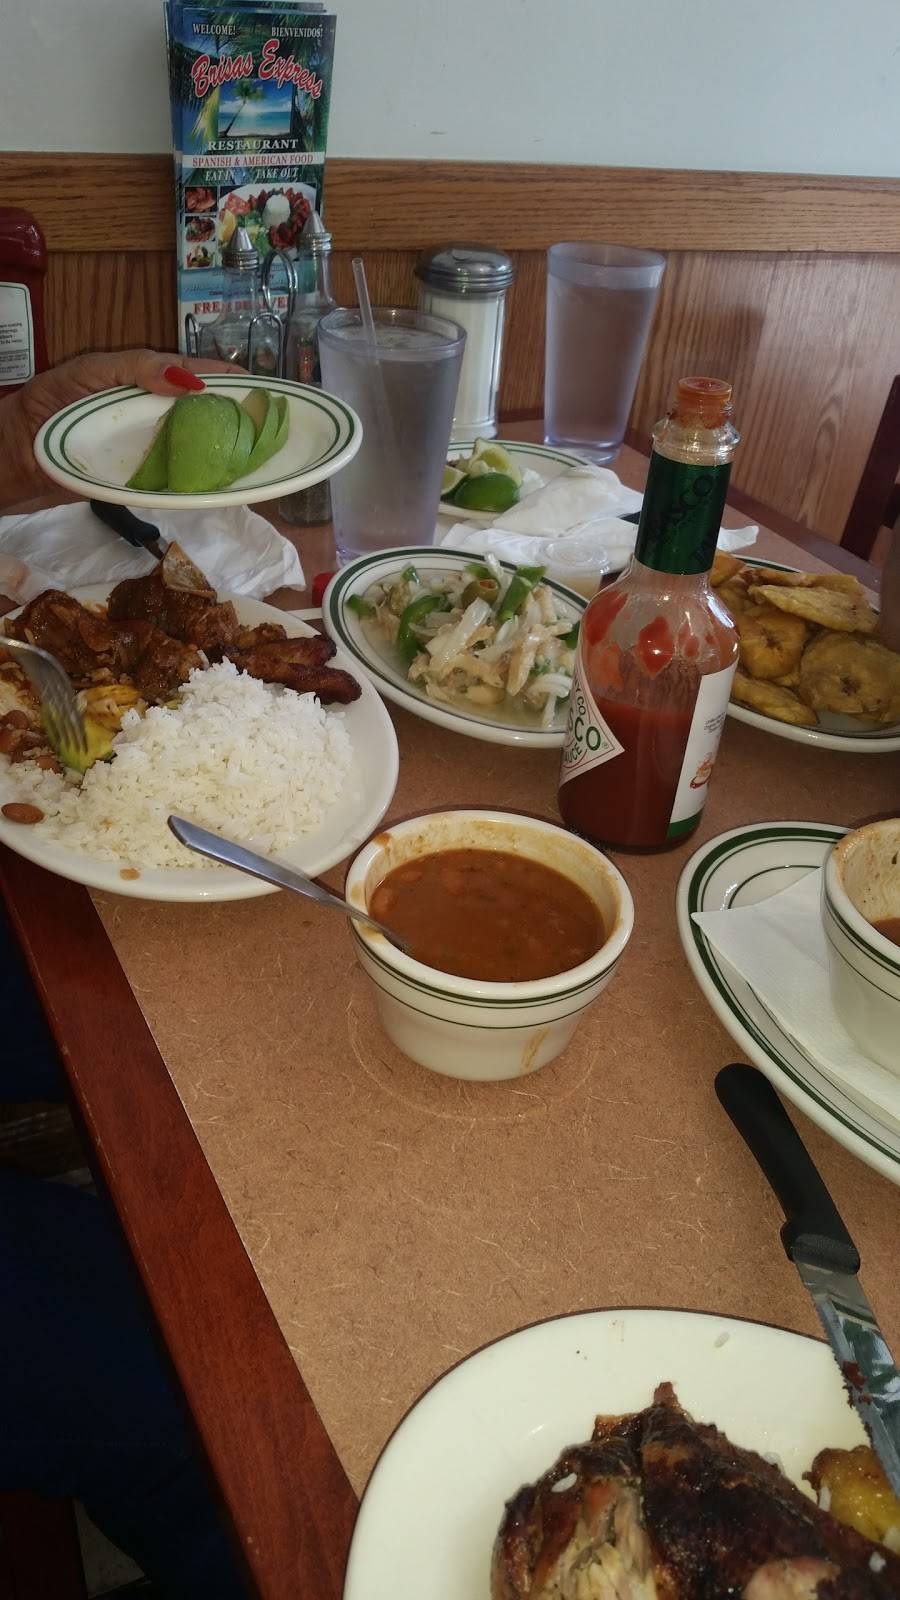 Brisas Express | restaurant | 1360 White Plains Rd, Bronx, NY 10460, USA | 3478513498 OR +1 347-851-3498